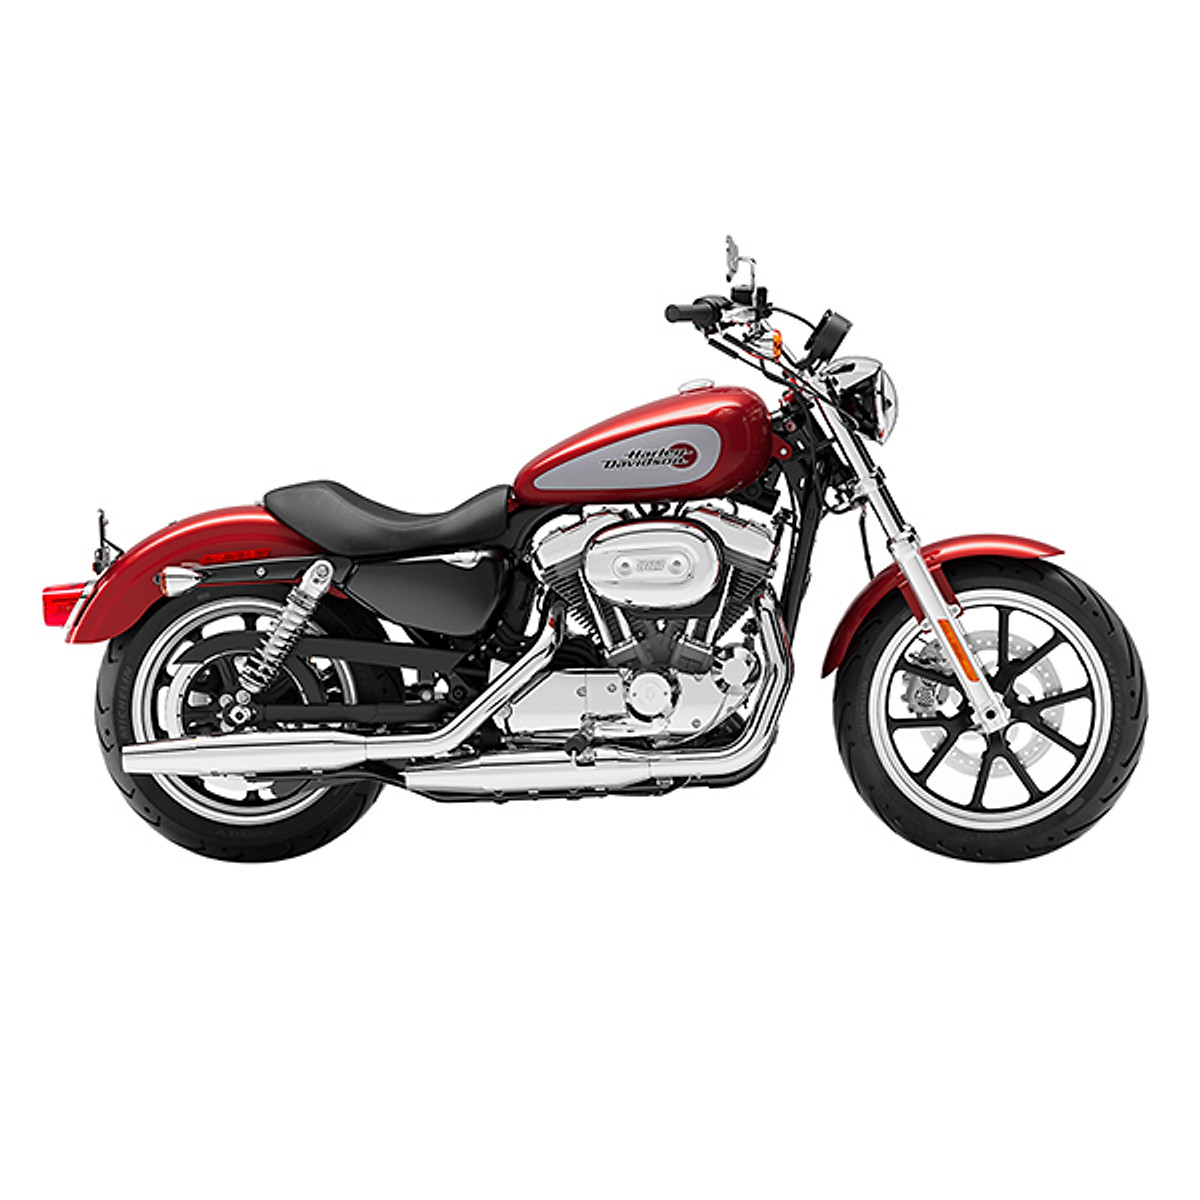 Đánh giá Xe Motor Harley Davidson SuperLow - 2019